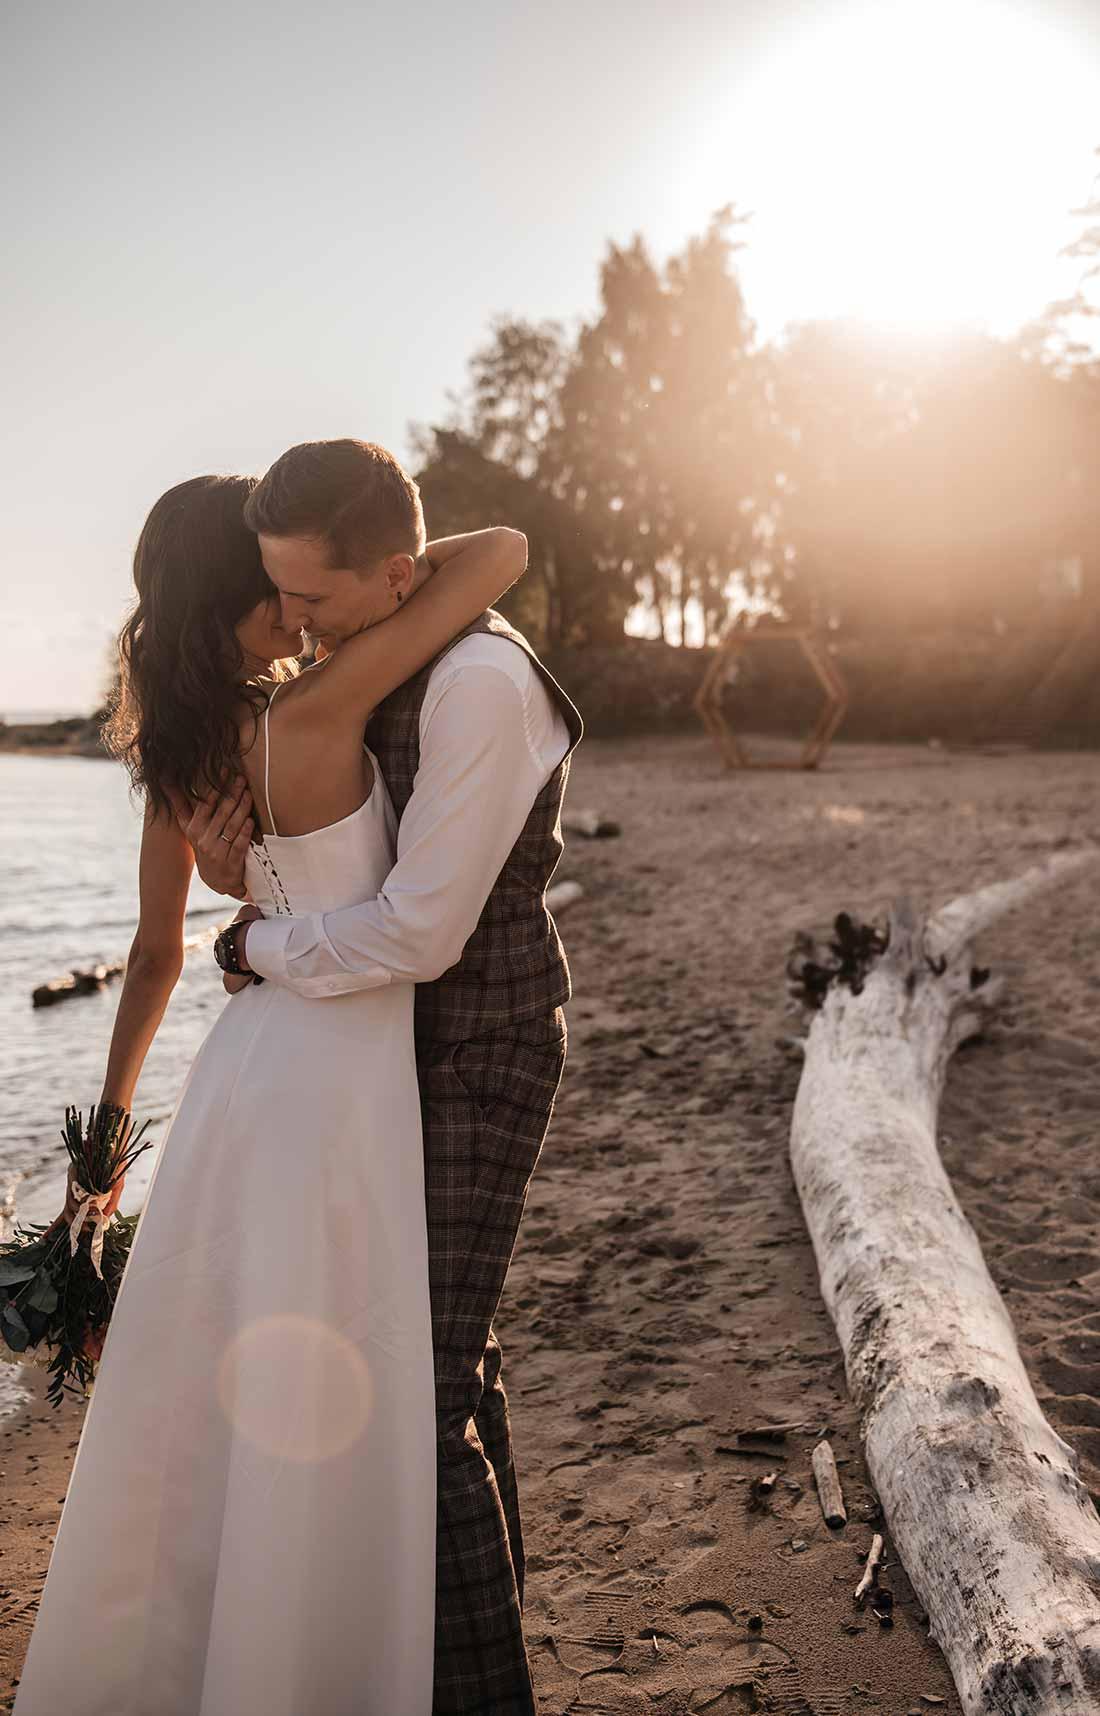 Hochzeit_Fotograf_1300x870px_16